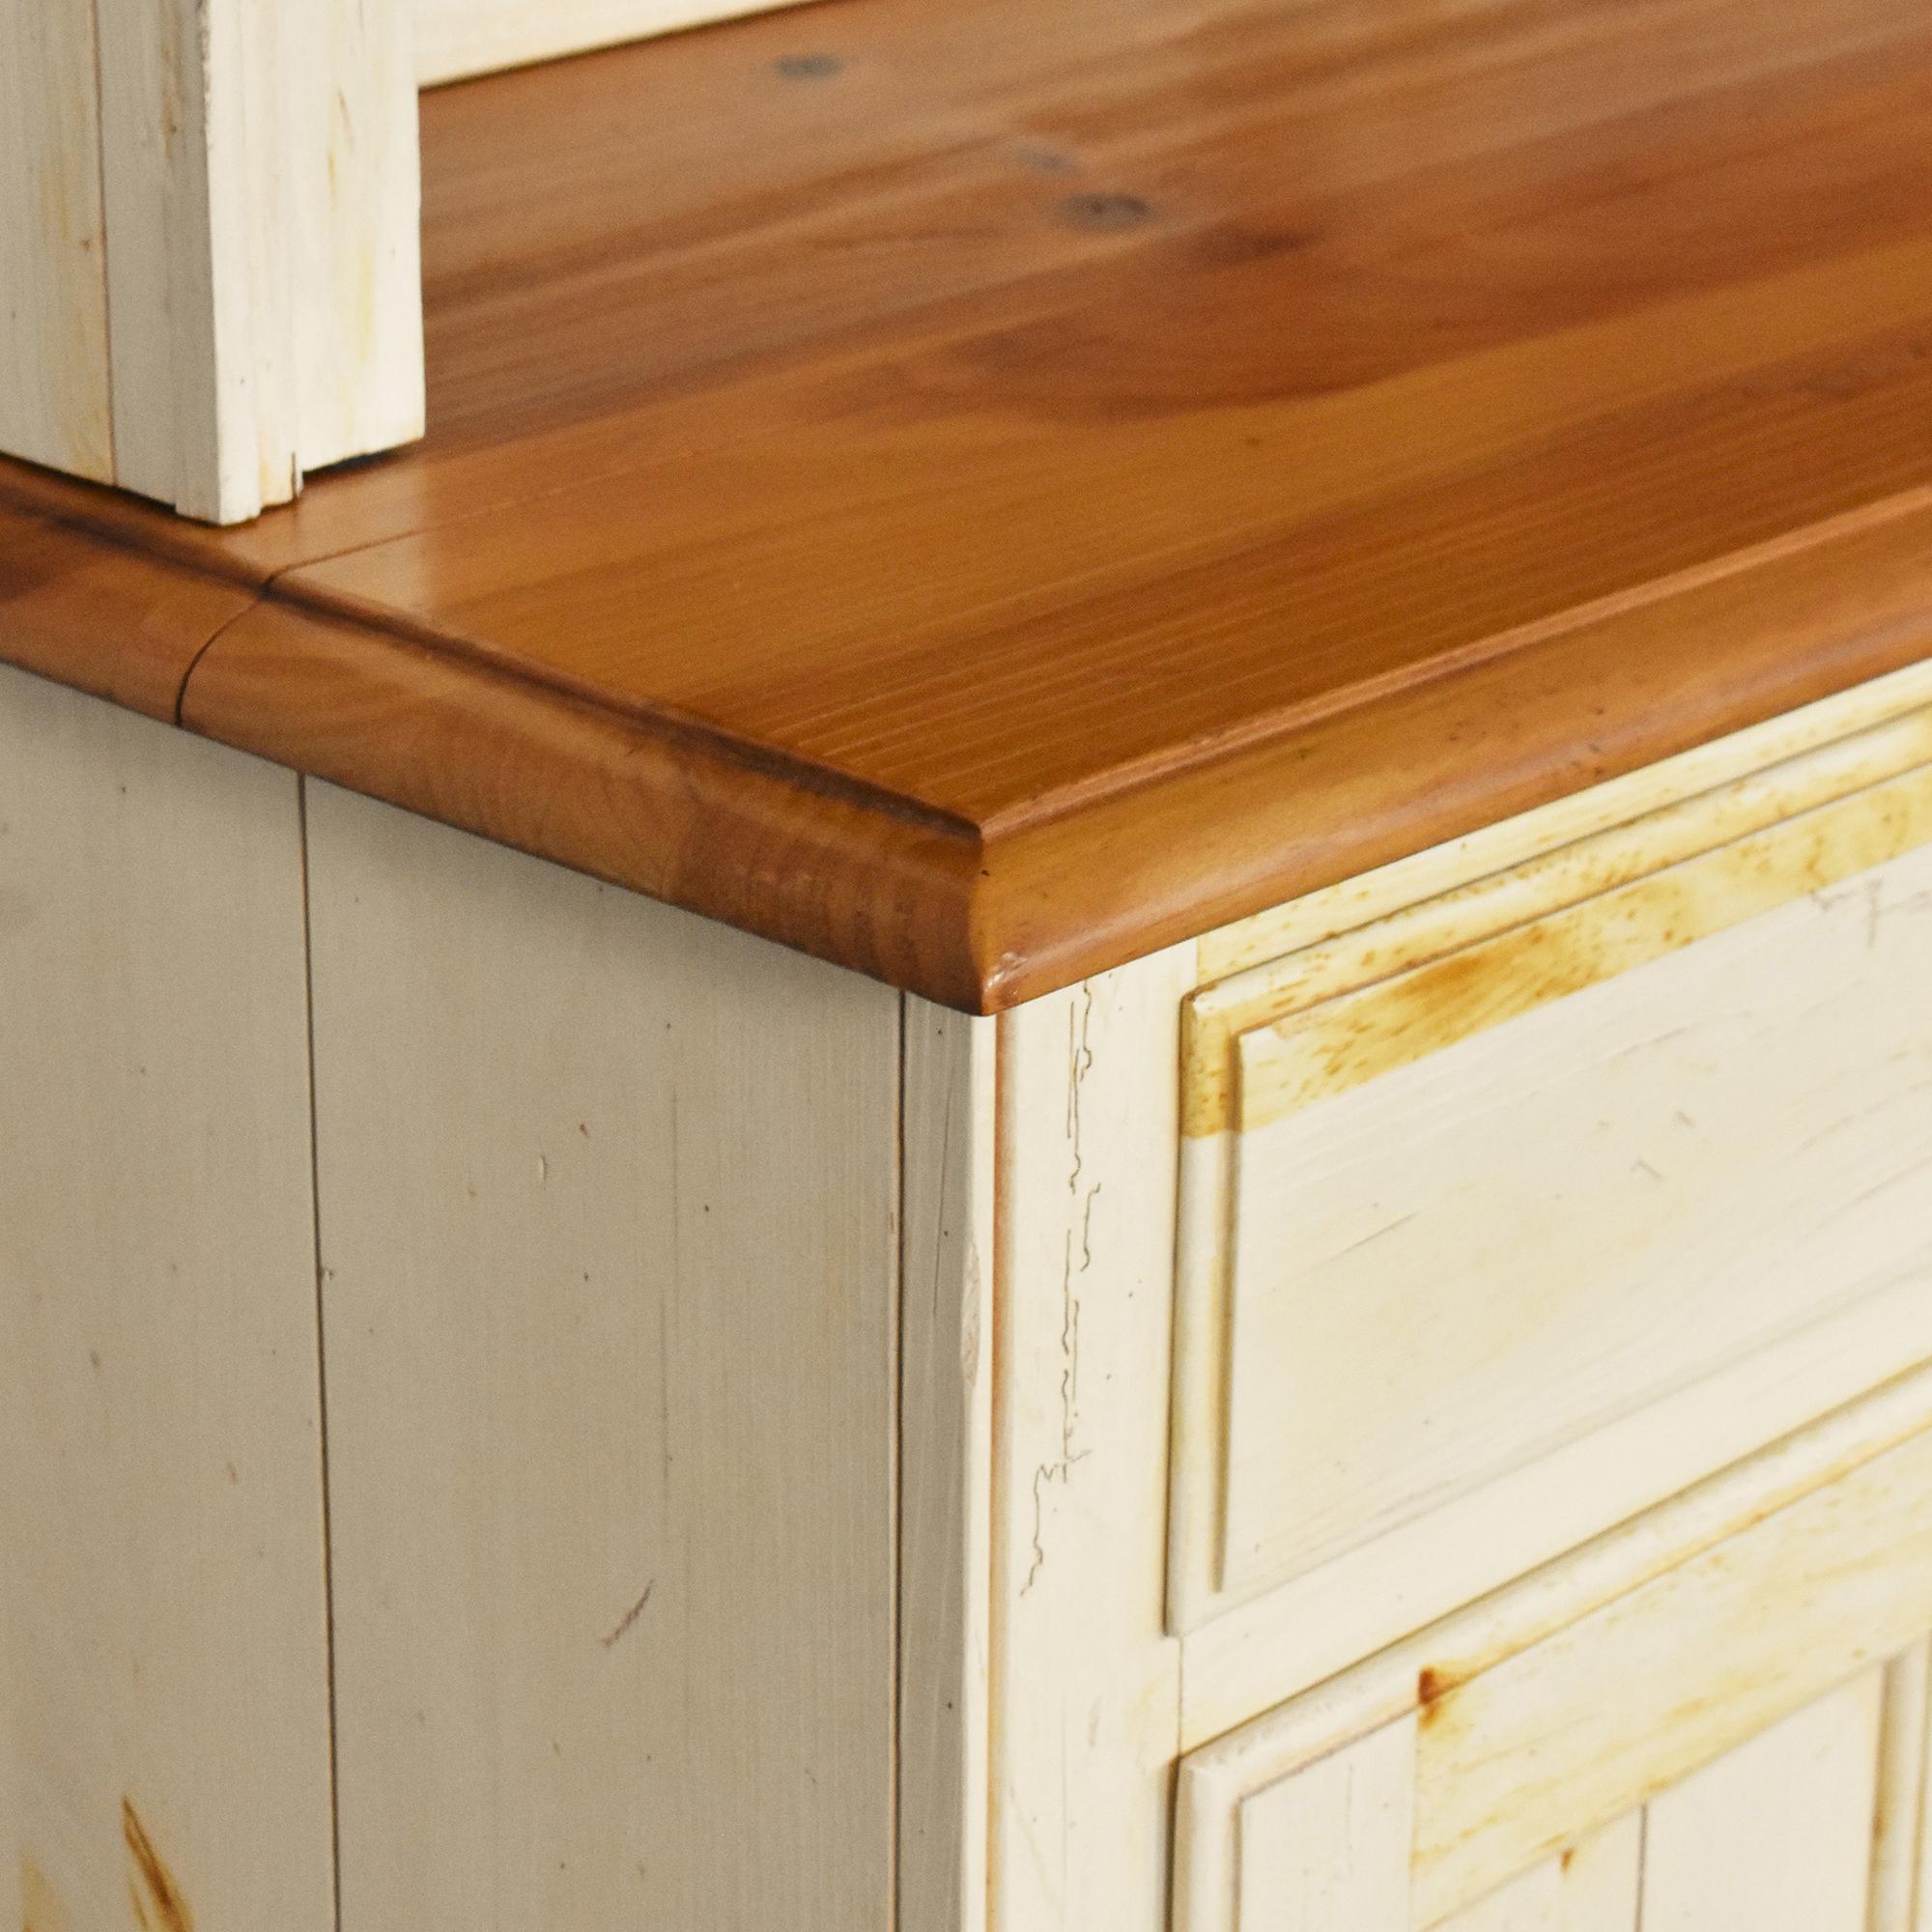 Ethan Allen Ethan Allen Farmhouse Cabinet with Hutch on sale